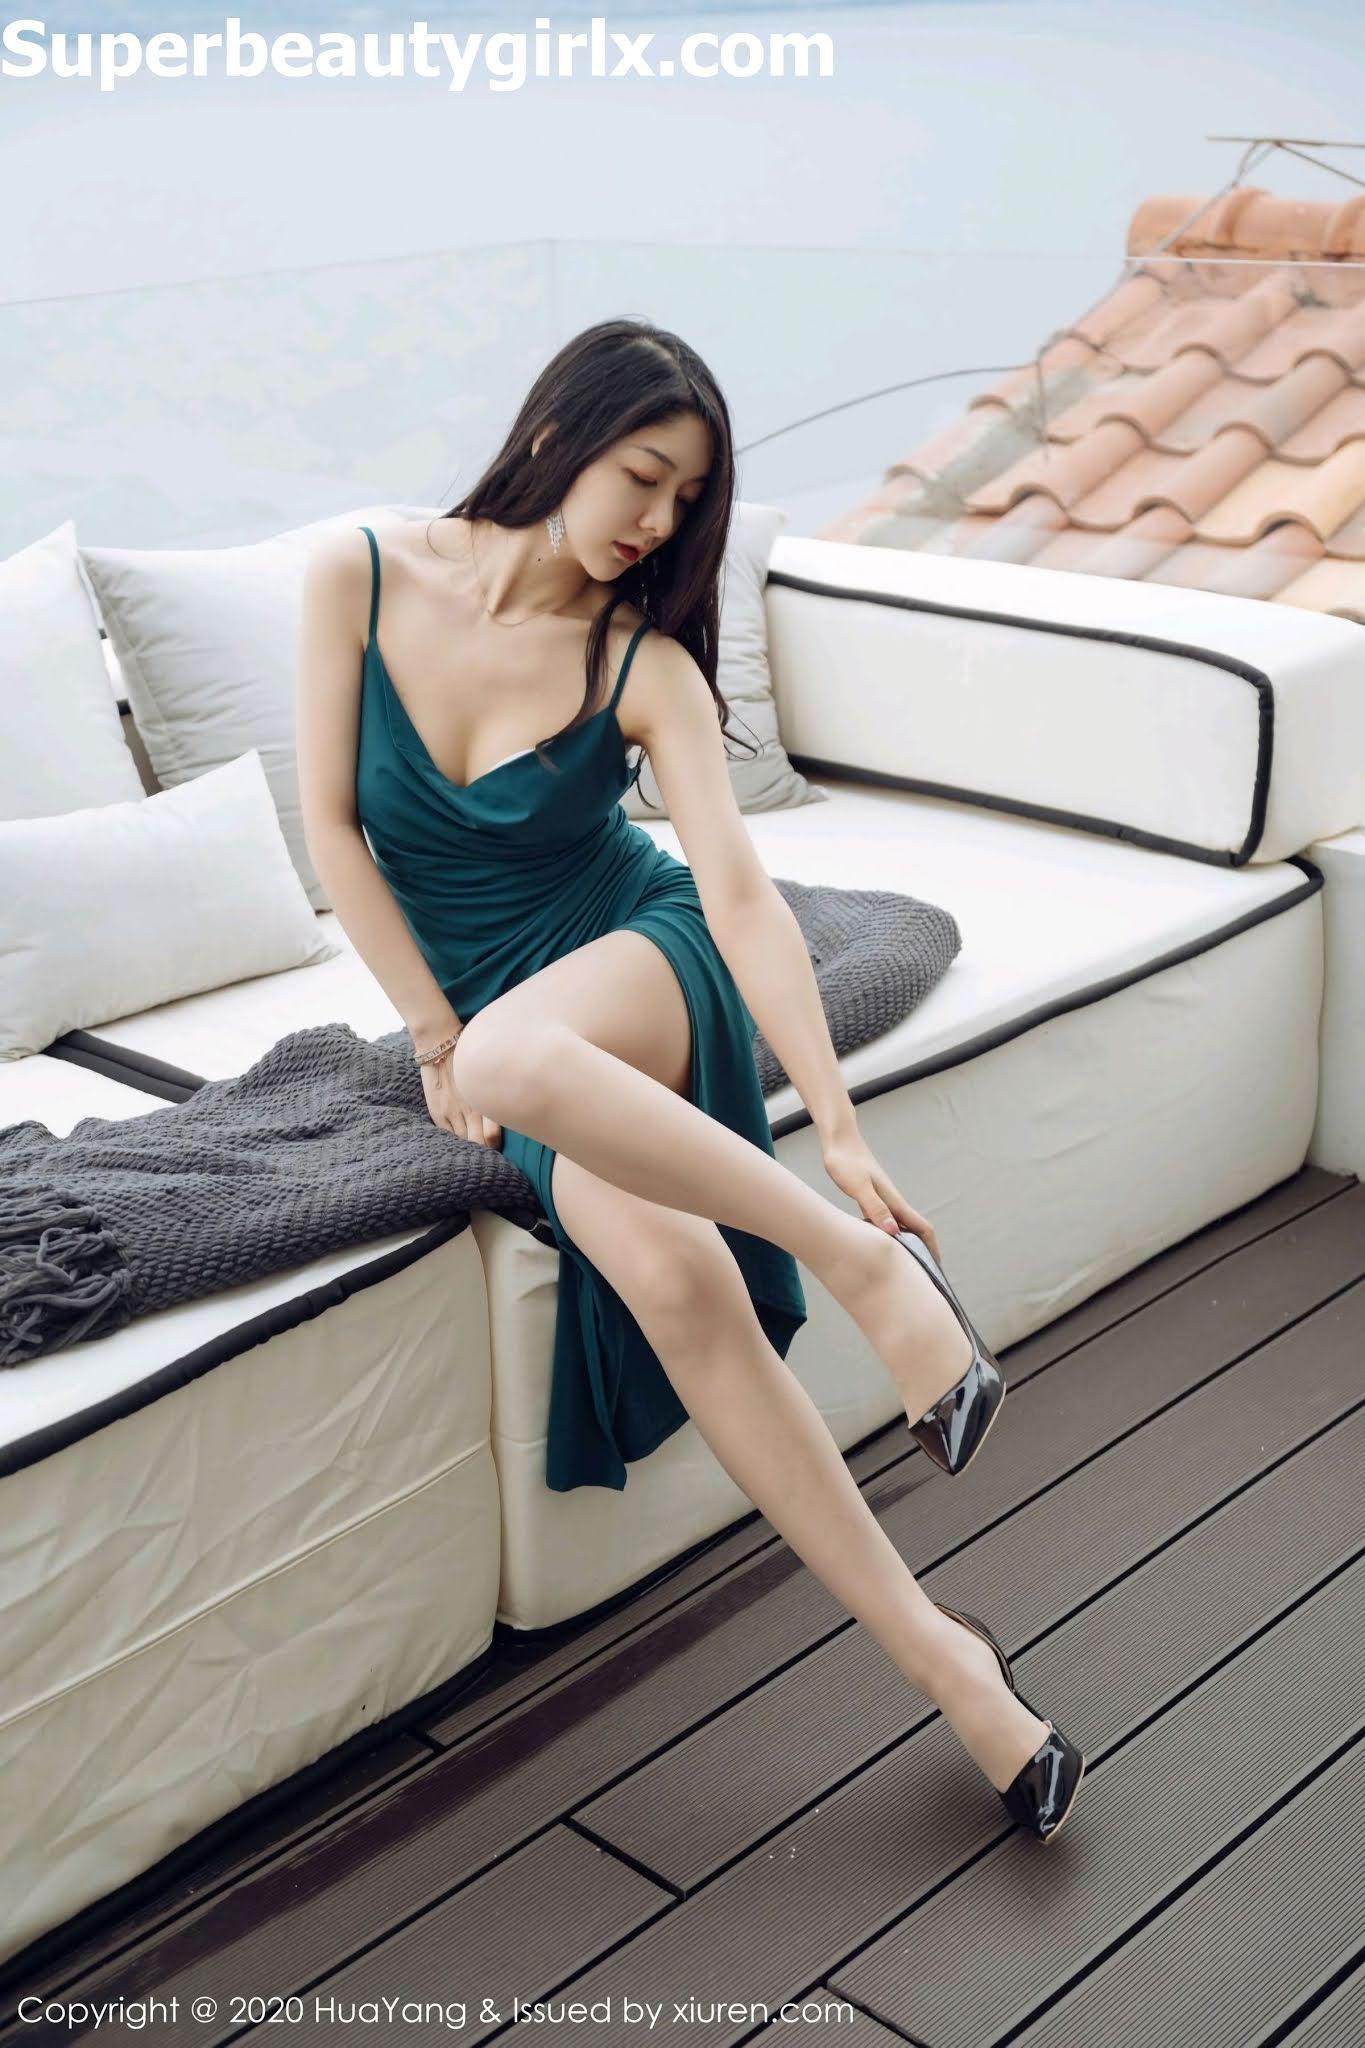 HuaYang-Vol.285-Xiao-Reba-Angela-Superbeautygirlx.com